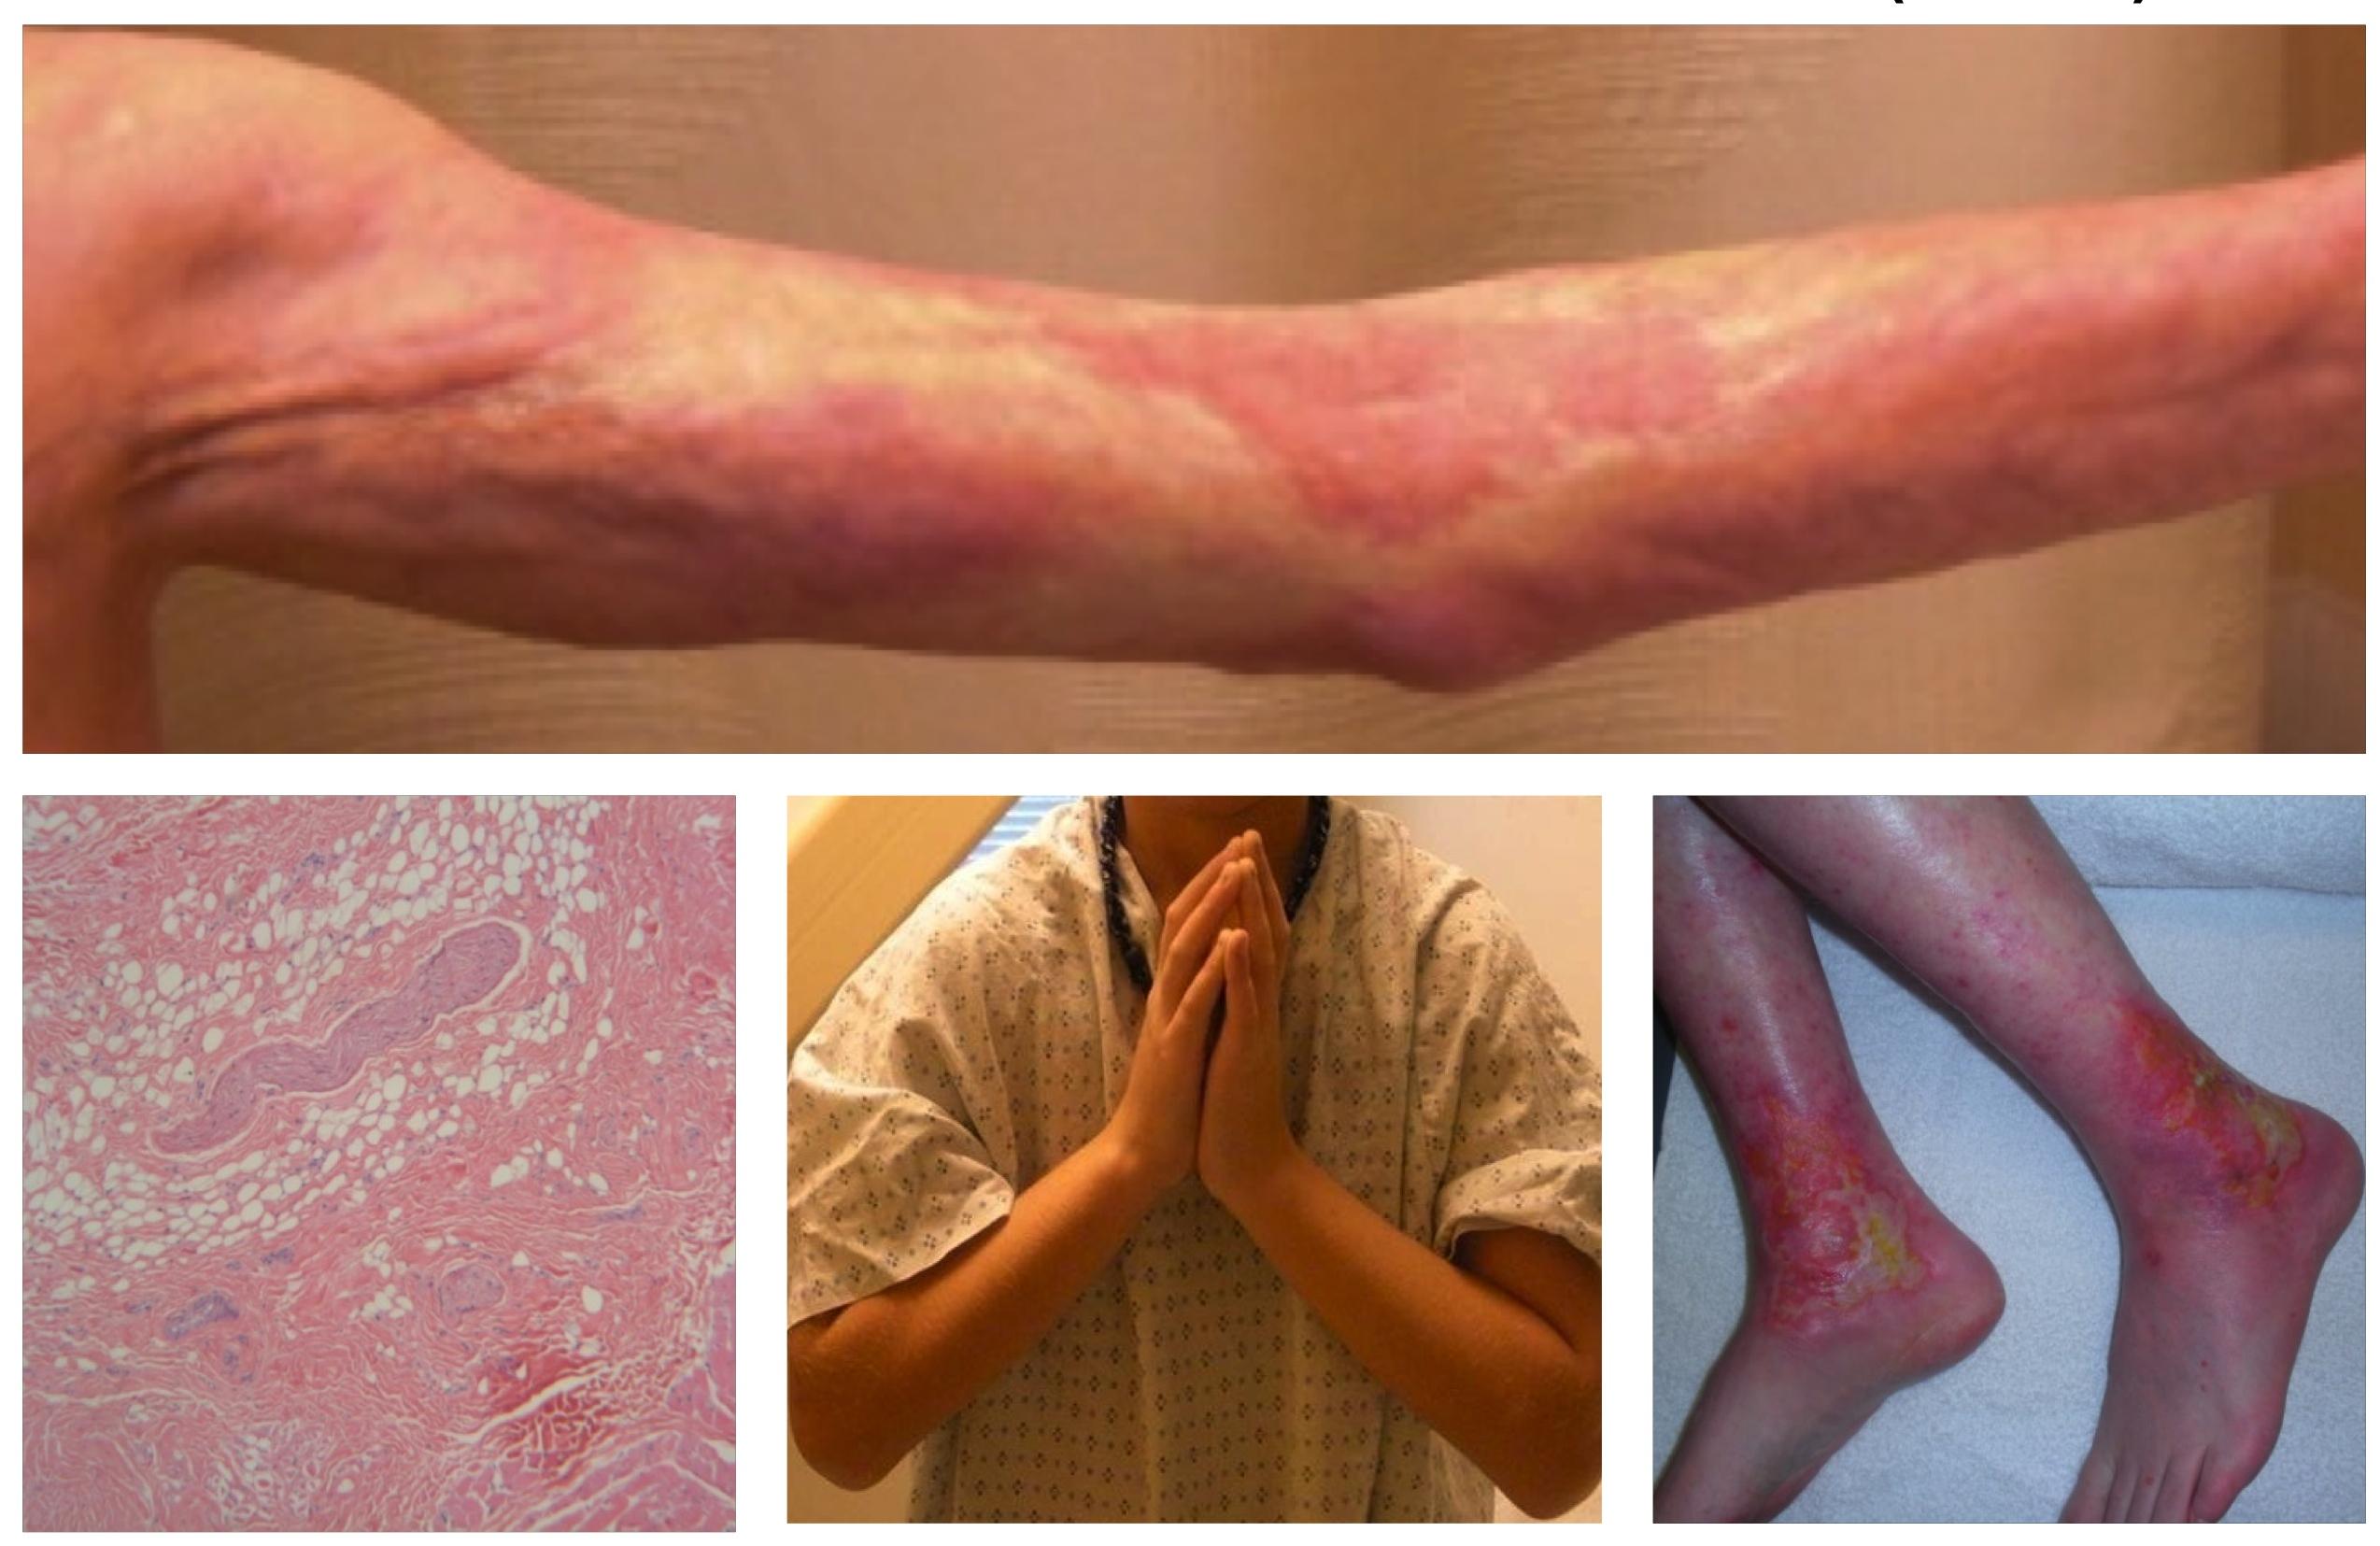 Image result for mucocutaneous graft vs host